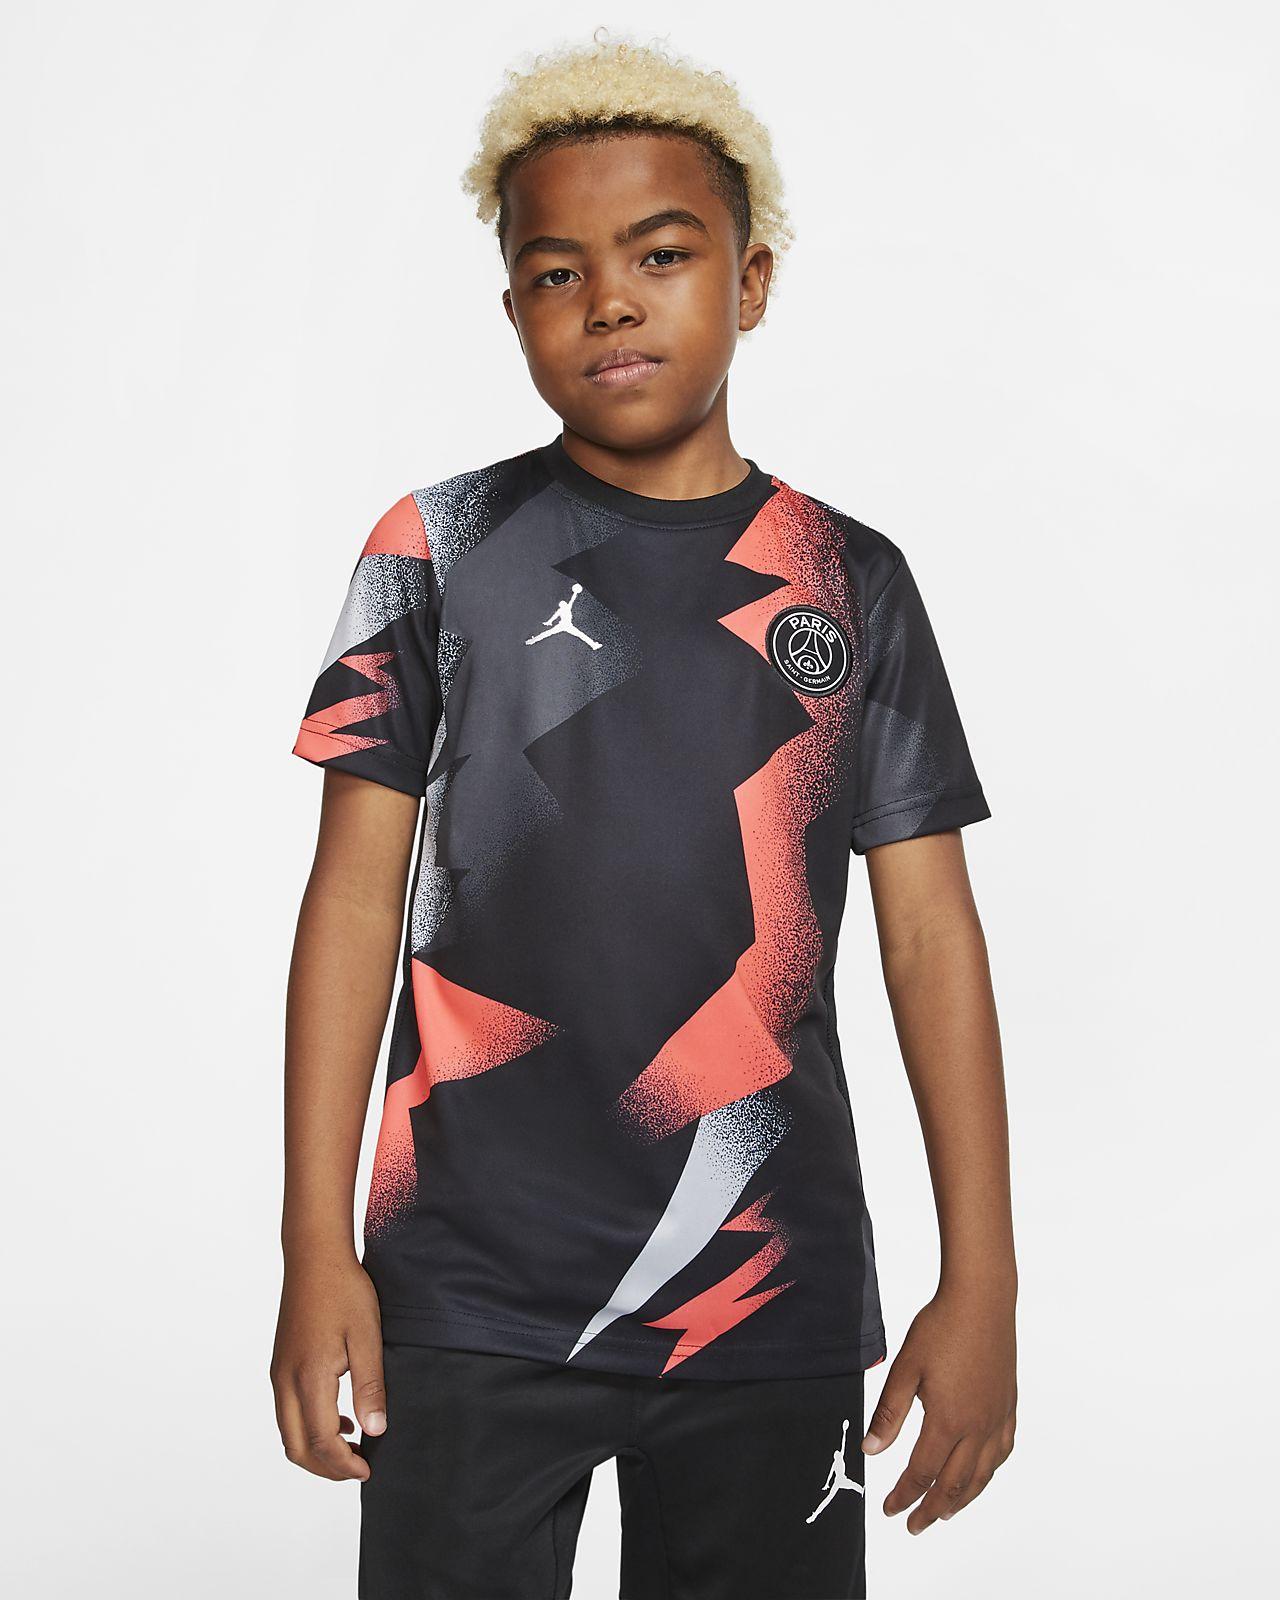 Jordan x Paris Saint-Germain kortermet fotballoverdel til barn